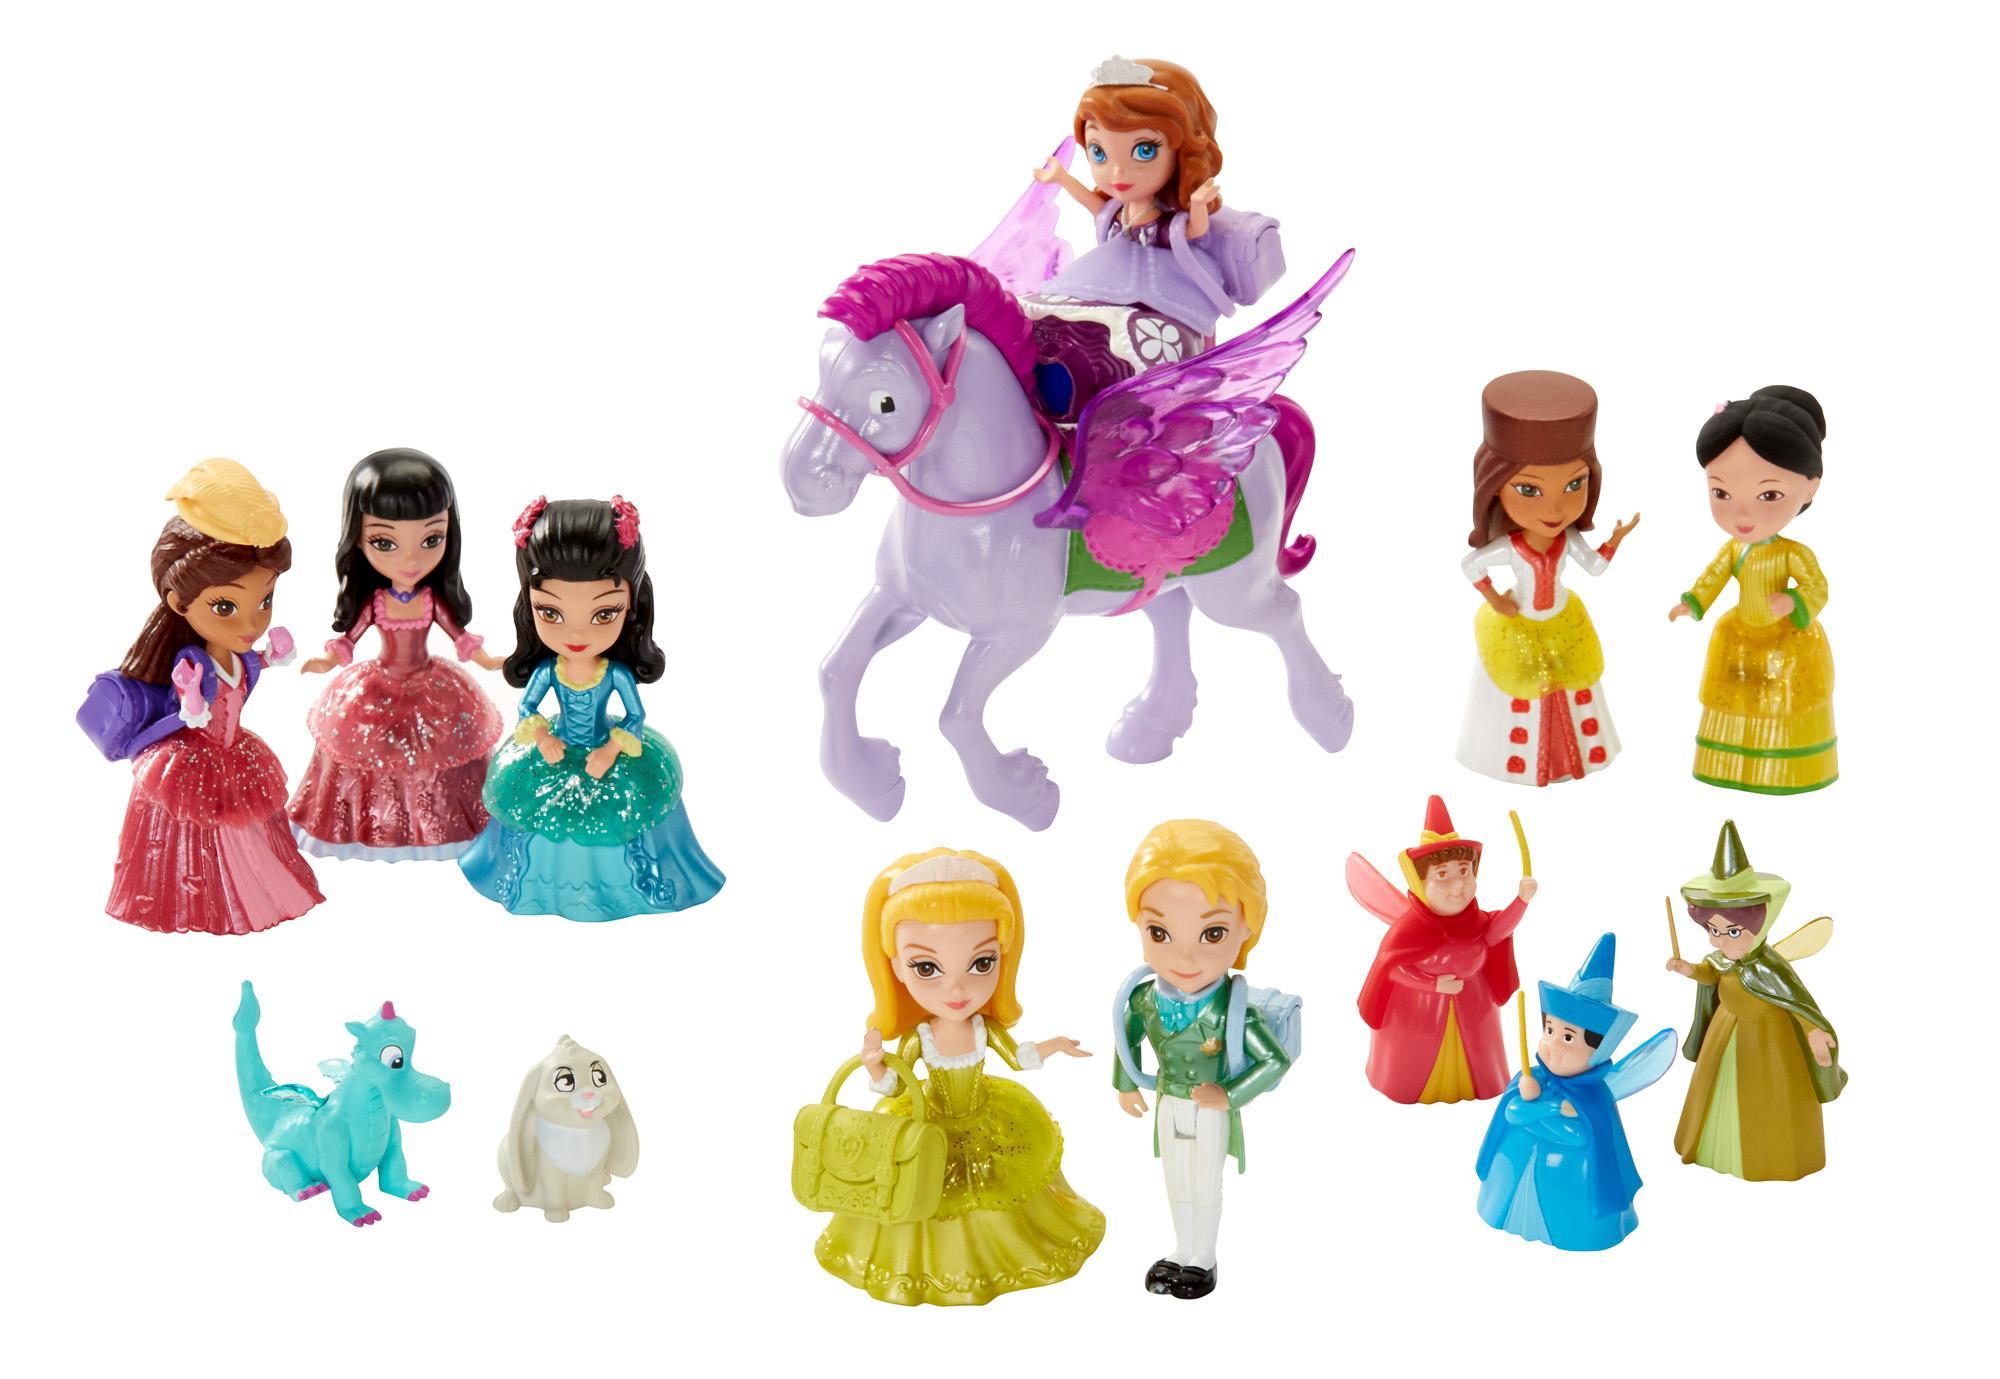 Disney Sofia The First Royal Prep Academy Doll Gift Pack: www.amazon.com/Disney-Sofia-First-Royal-Academy/dp/B00IVP13NO